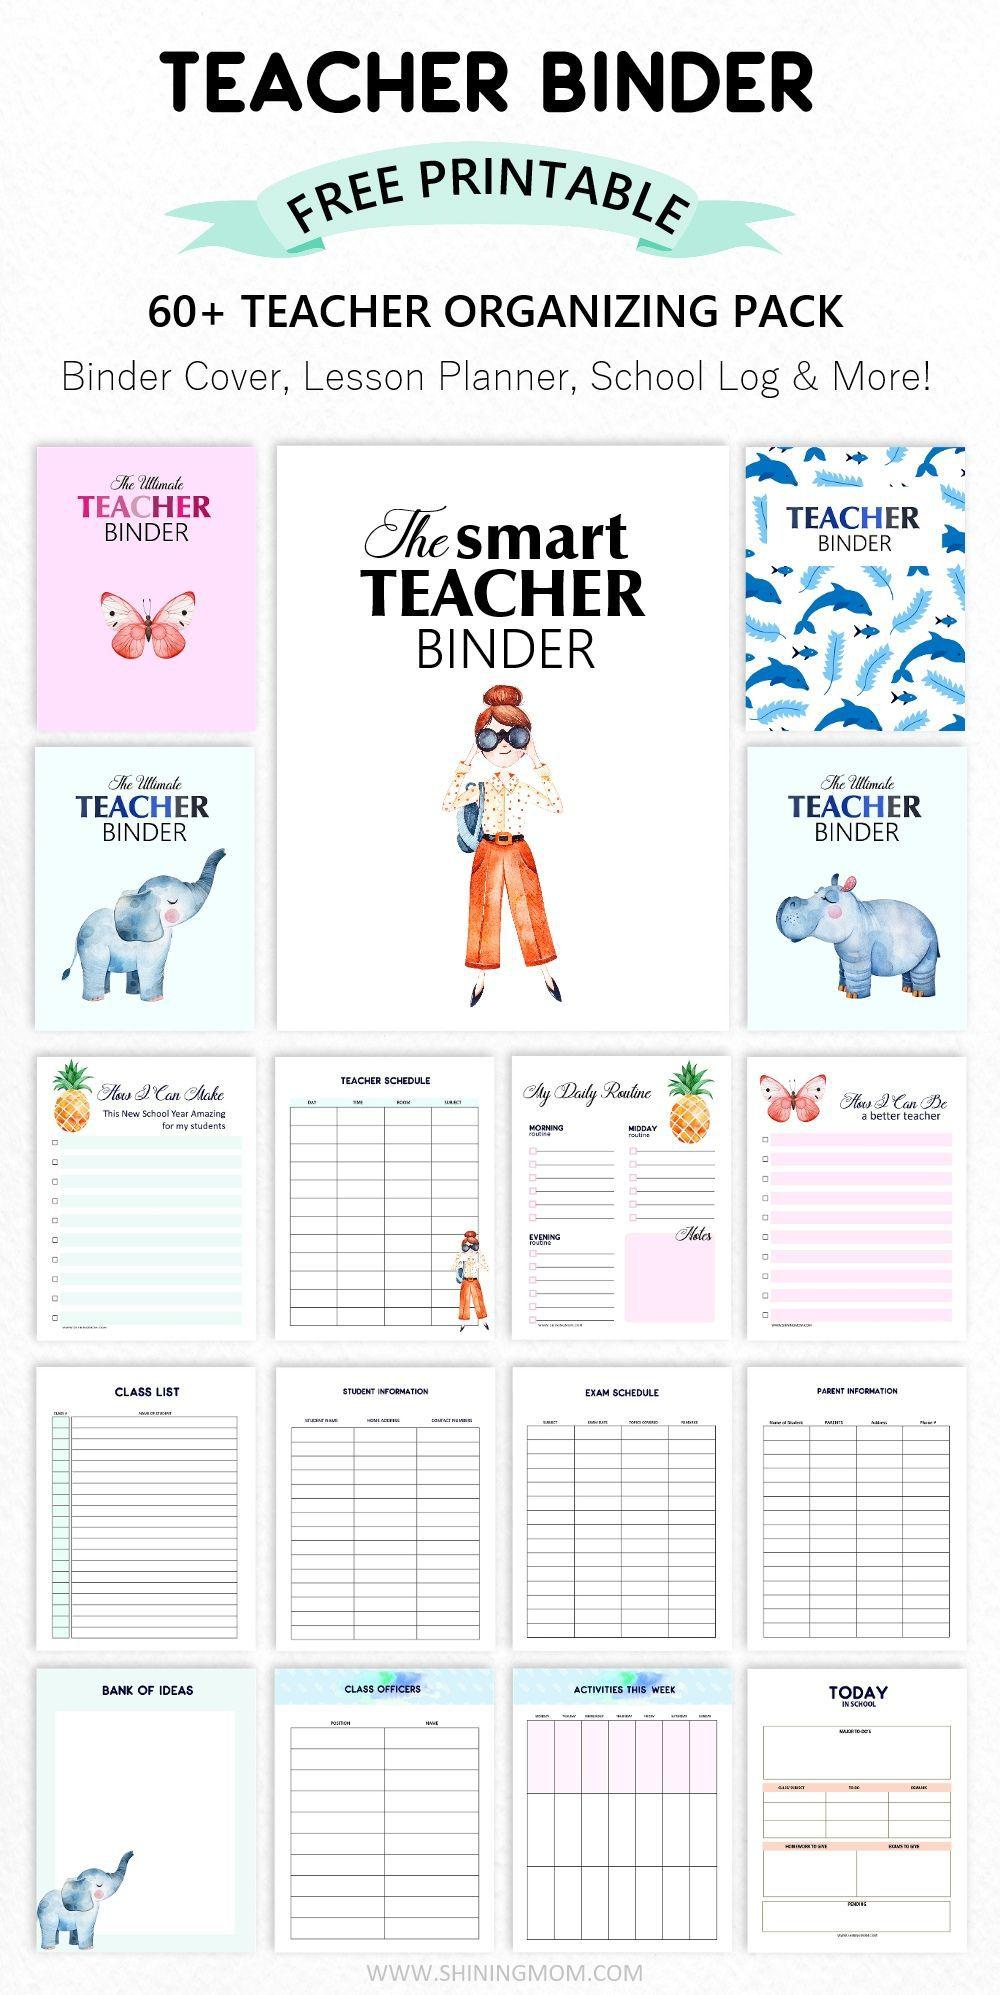 003 Formidable Free Printable Teacher Binder Template High Resolution  TemplatesFull